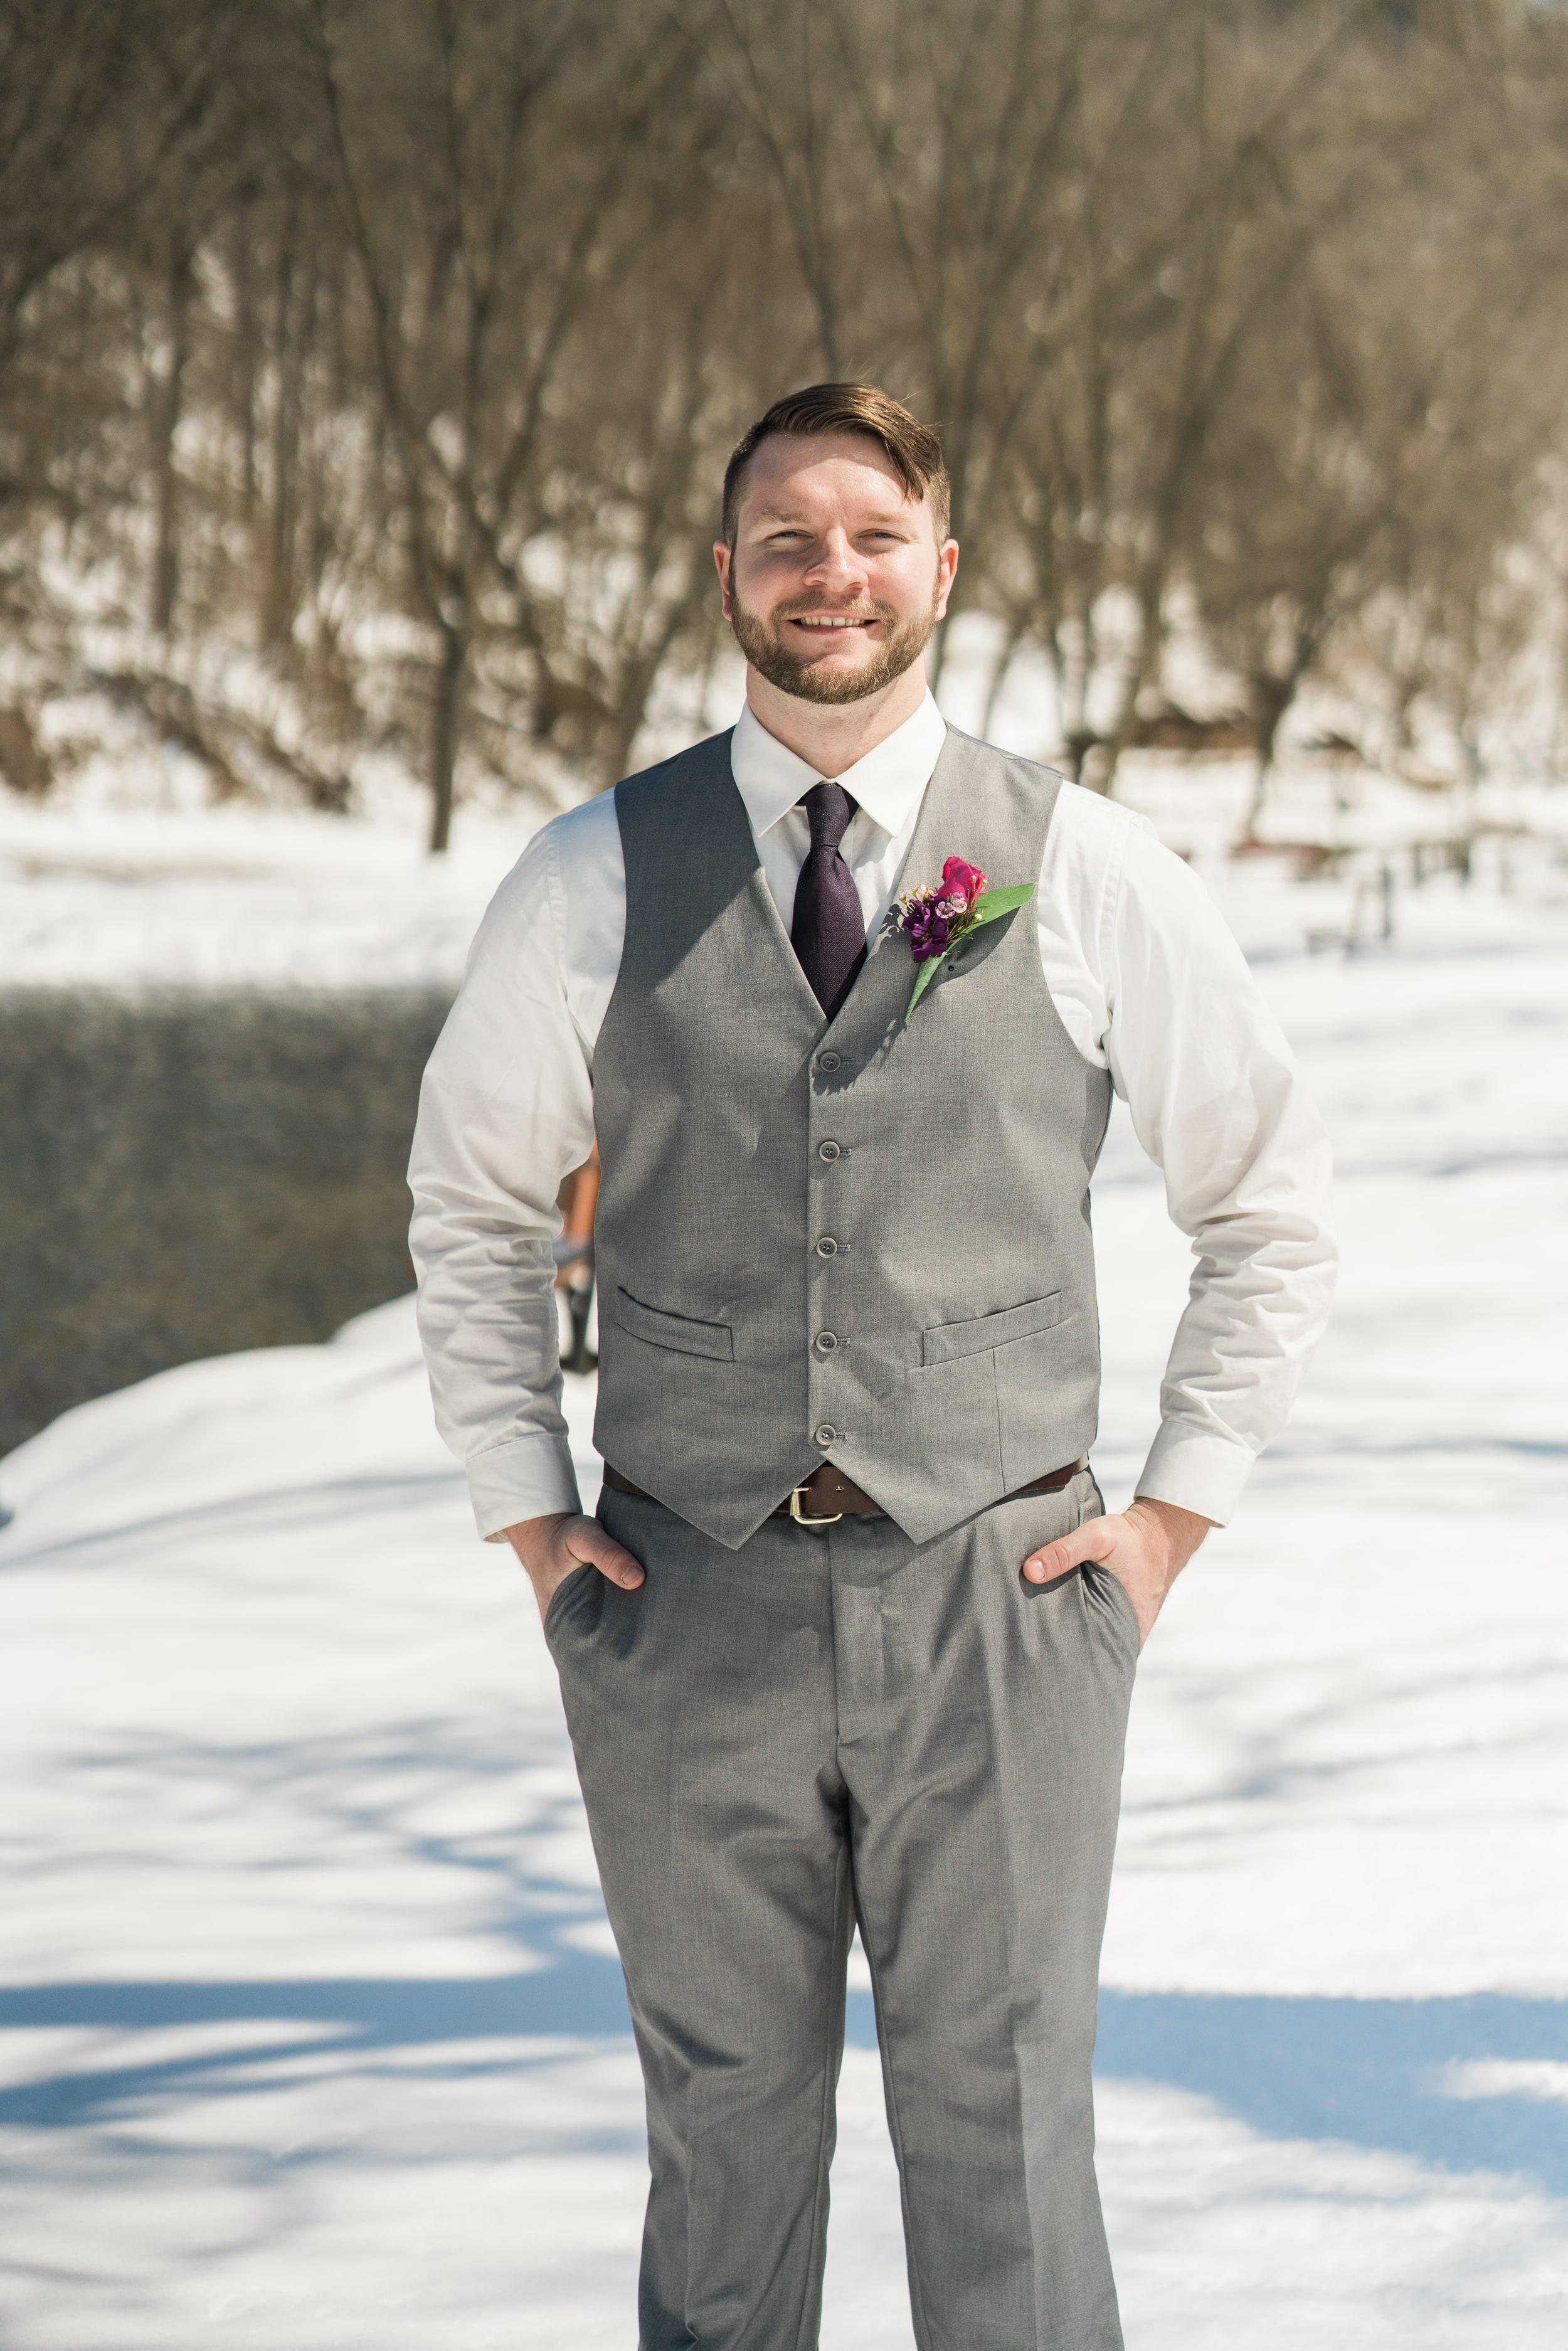 snowy-intimate-wedding-23.jpg